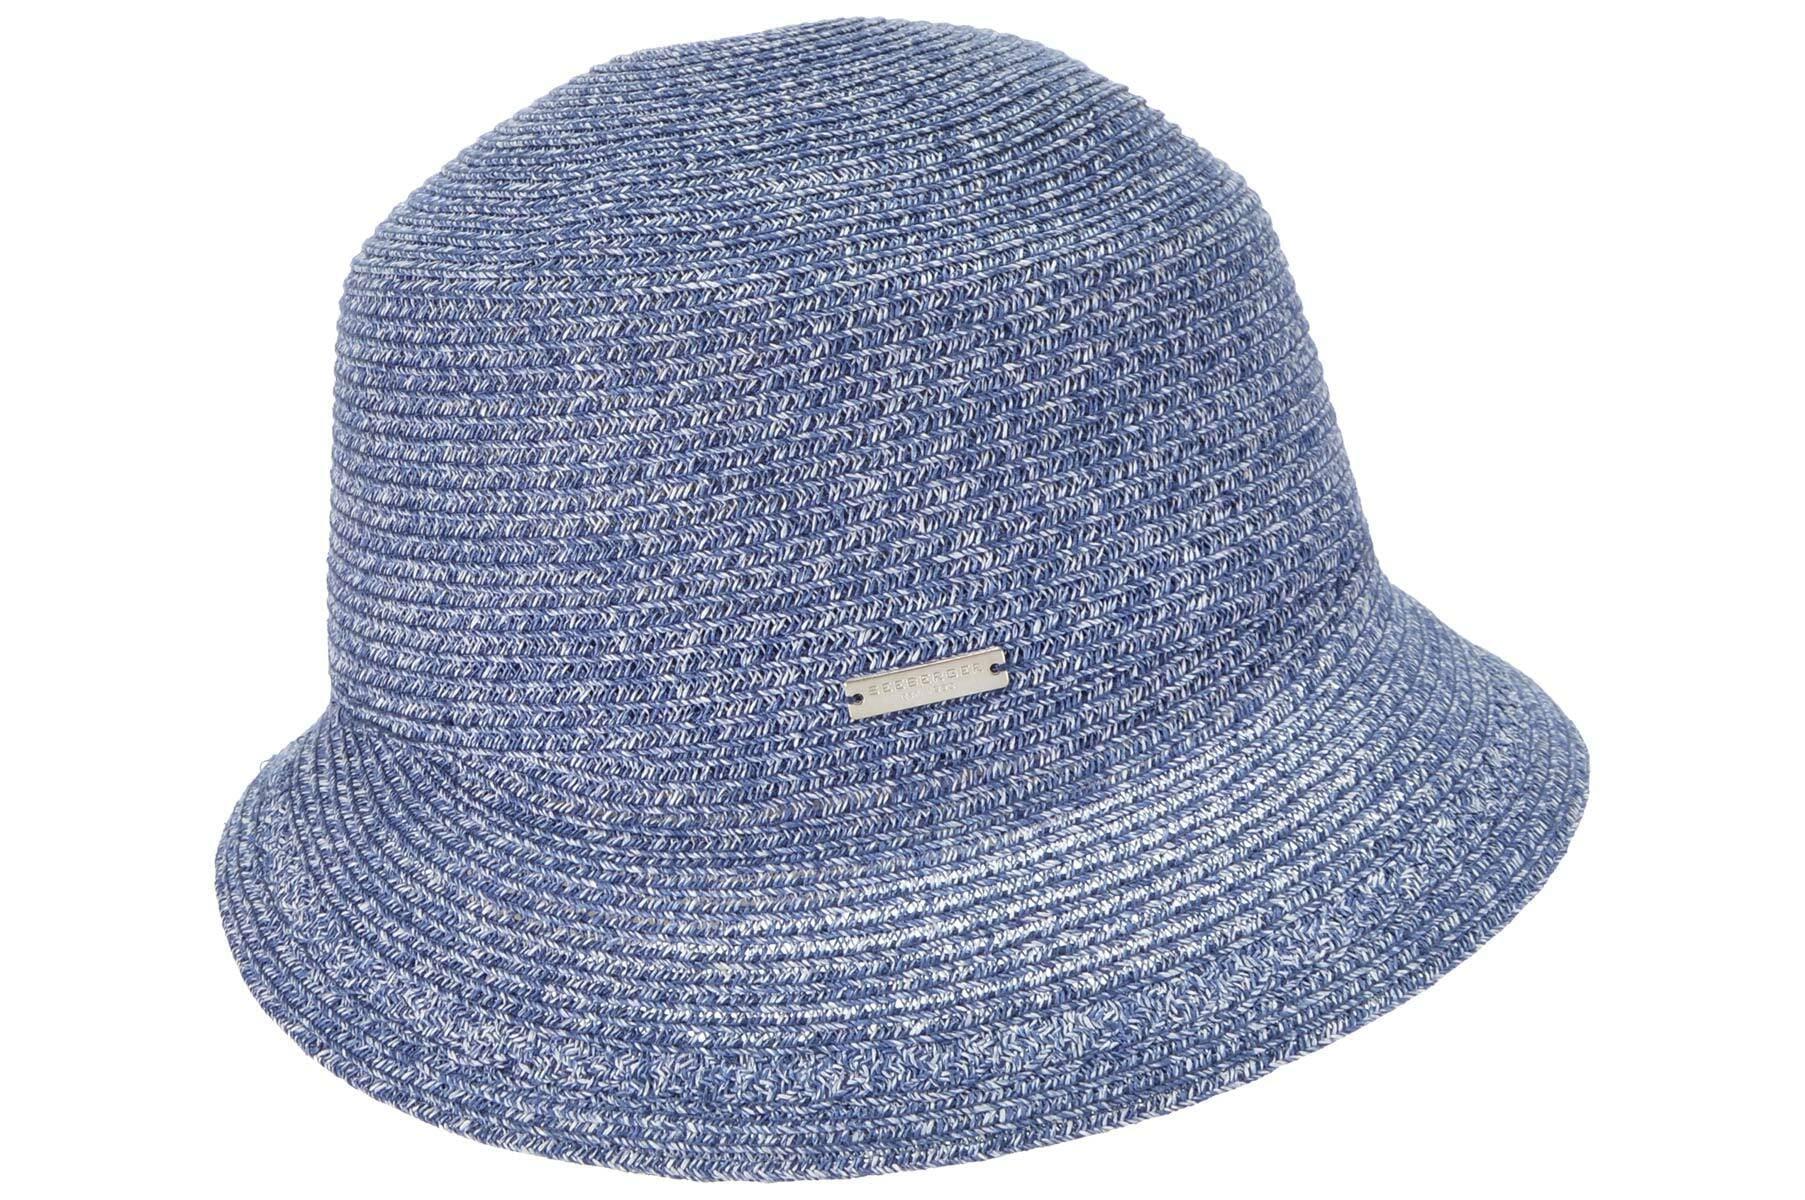 Seeberger Strohhut Glocke aus leichtem Papierstroh 54487-0 | Accessoires > Hüte > Strohhüte | Seeberger